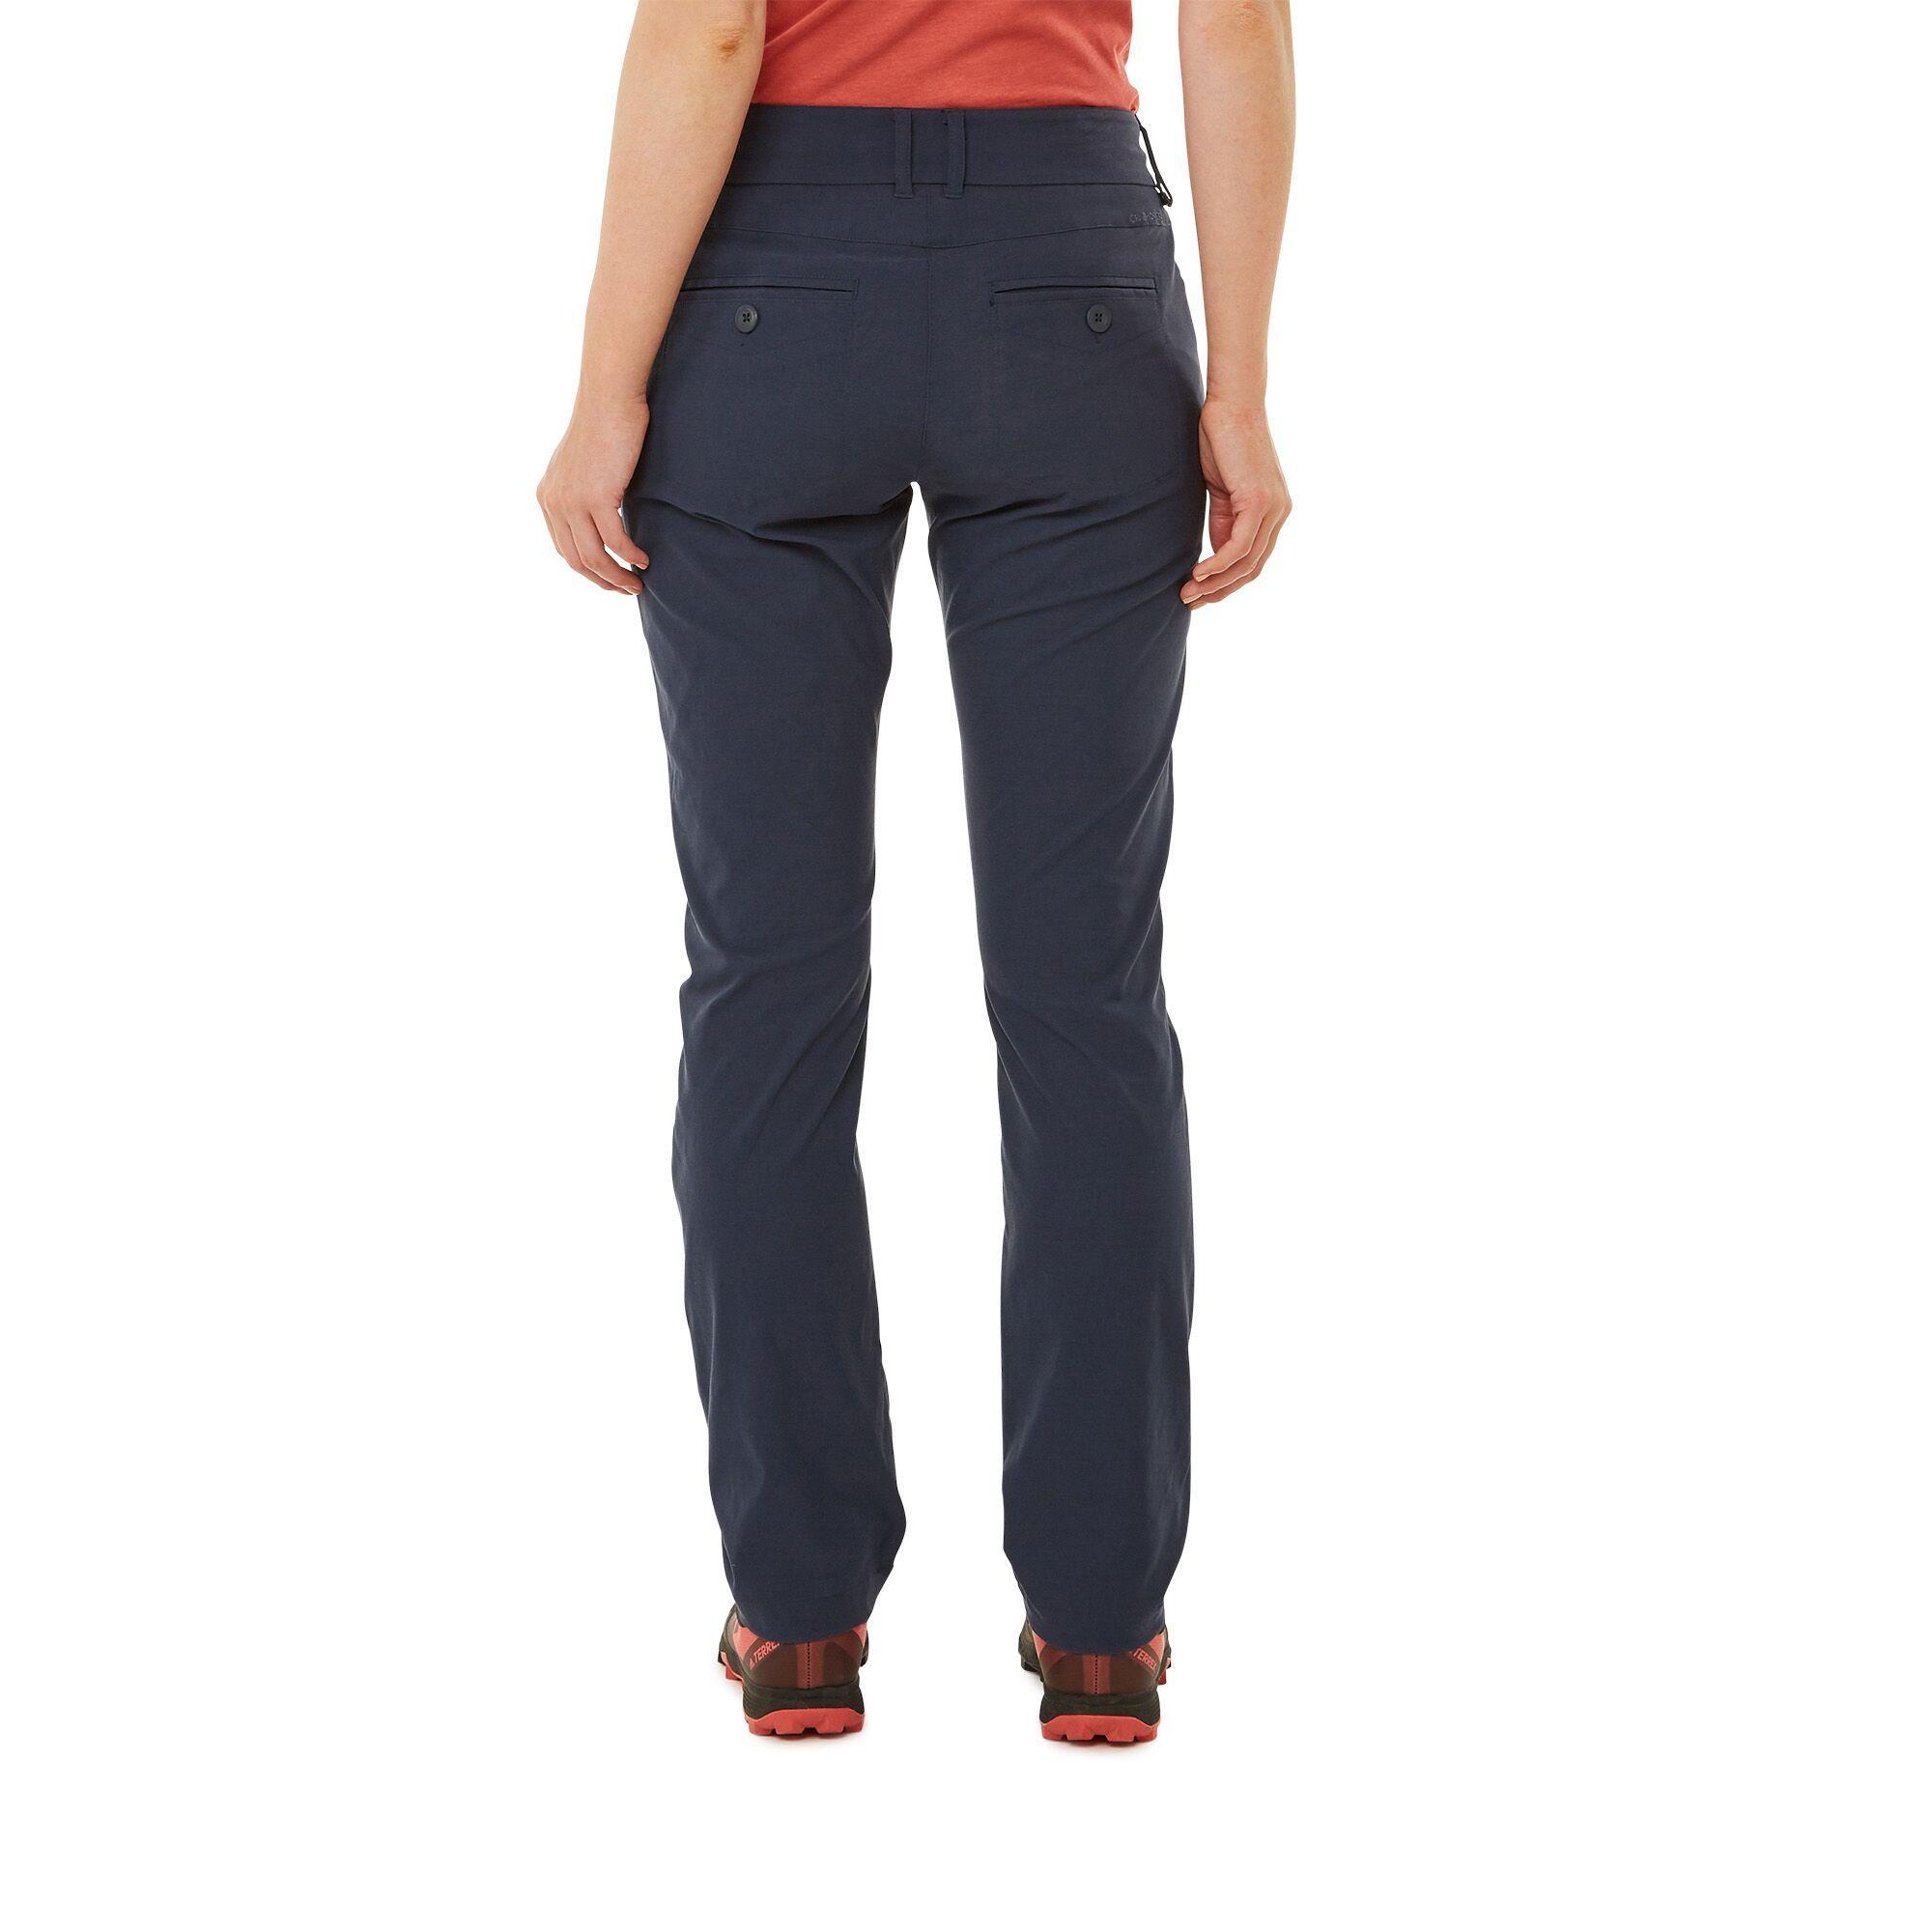 Craghoppers-Pantalon-CLARA-Femme-CG1066 miniature 5